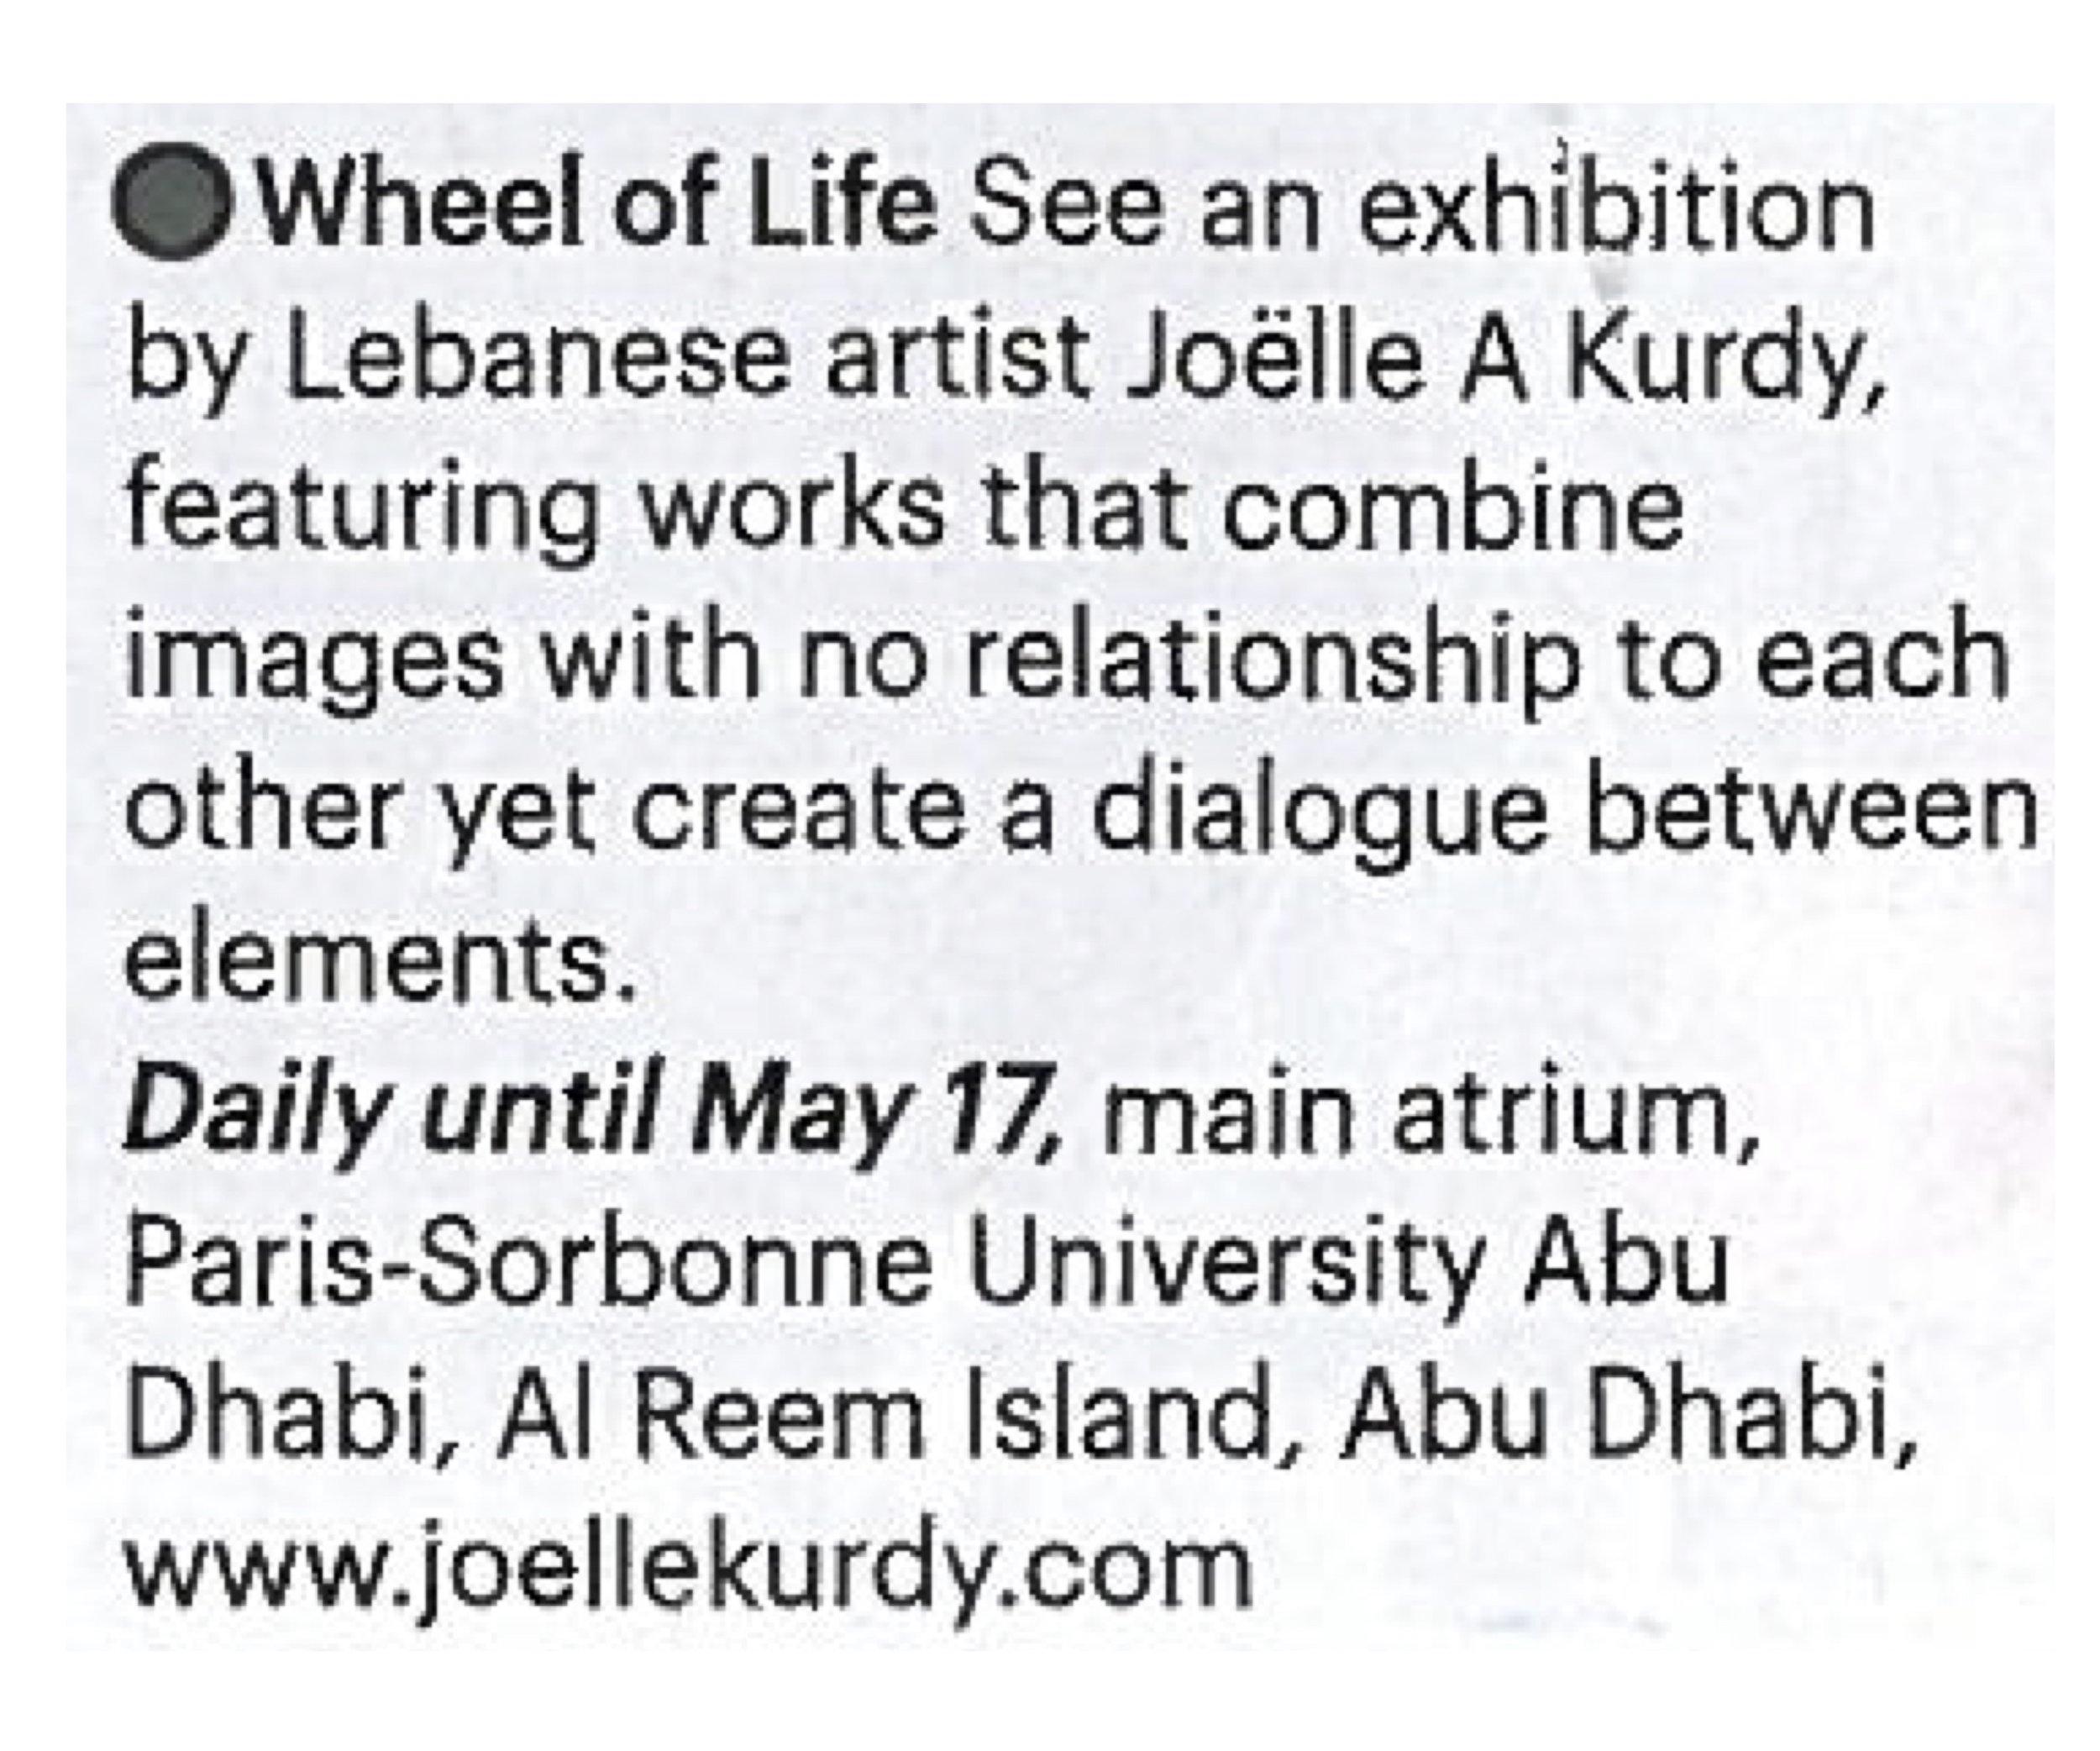 Joelle A Kurdy  - May 13th 2016 - The National copy3.jpg